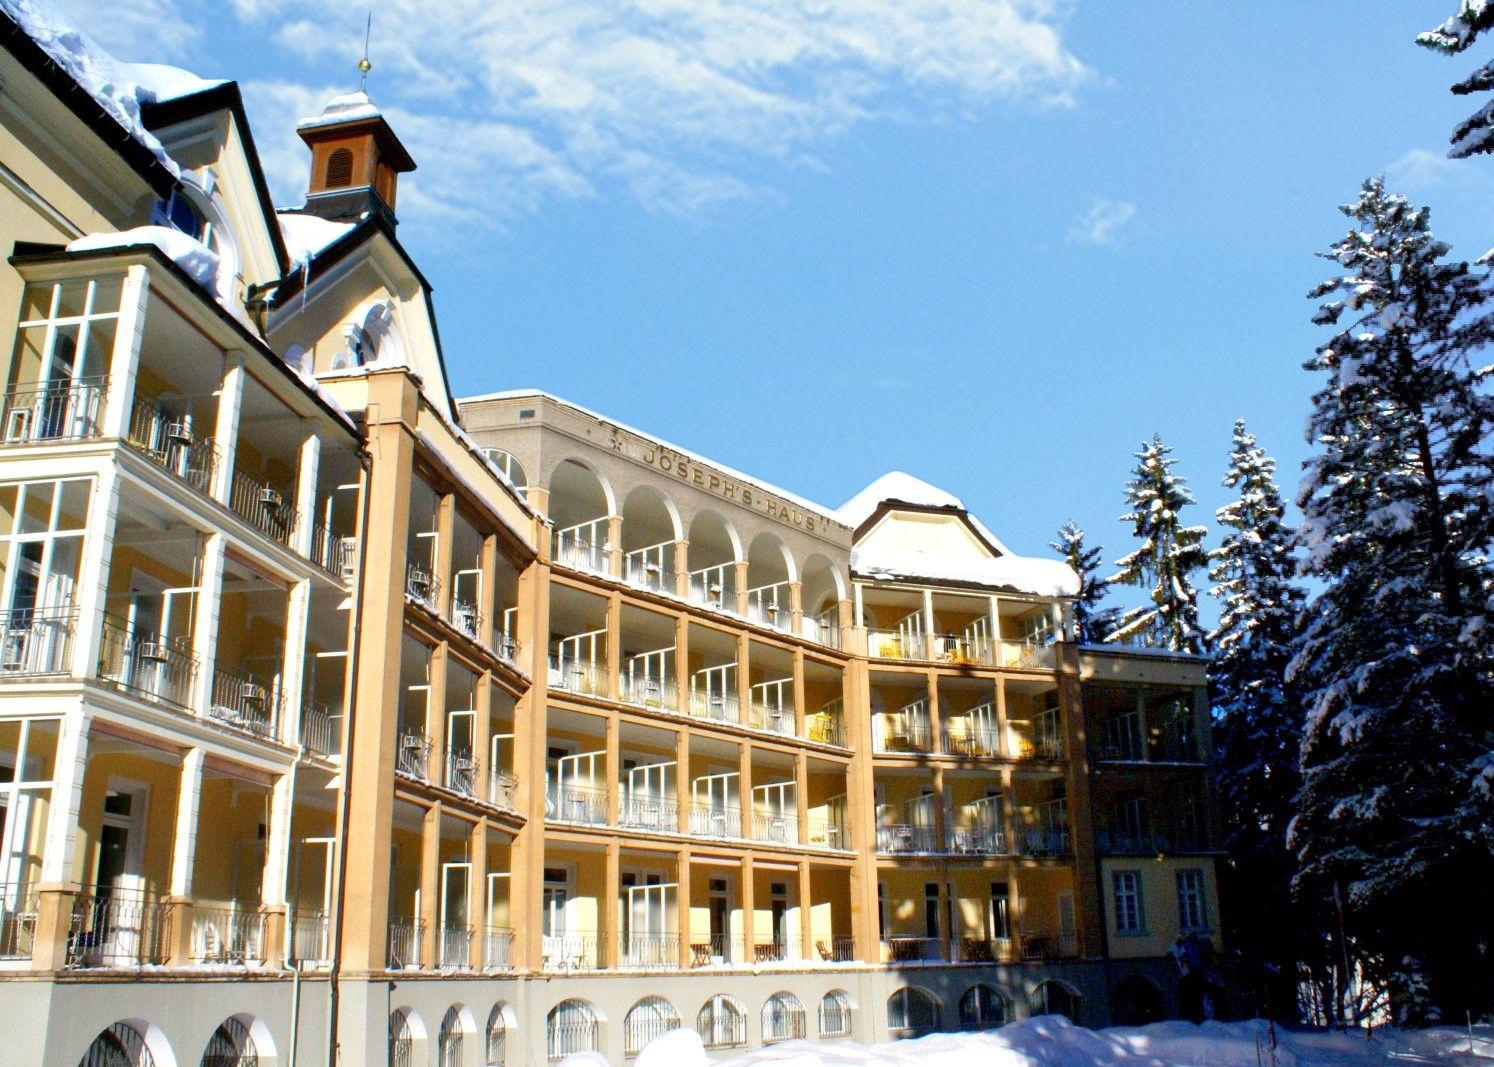 hotel josephs house